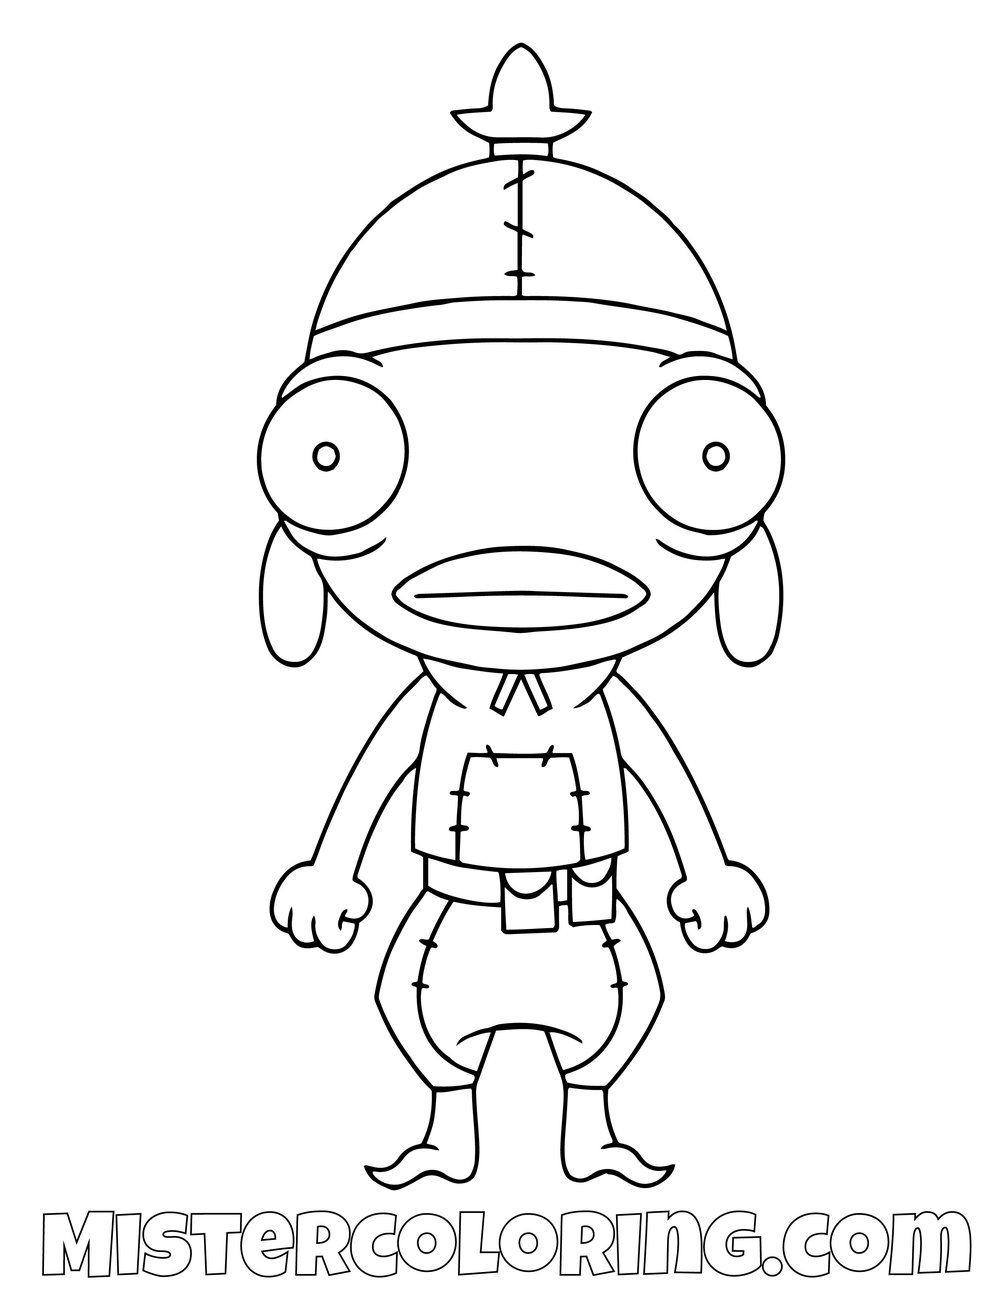 Fishstick Chibi Skin Fortnite Coloring Page Cartoon Coloring Pages Coloring Pages Coloring Pages For Kids